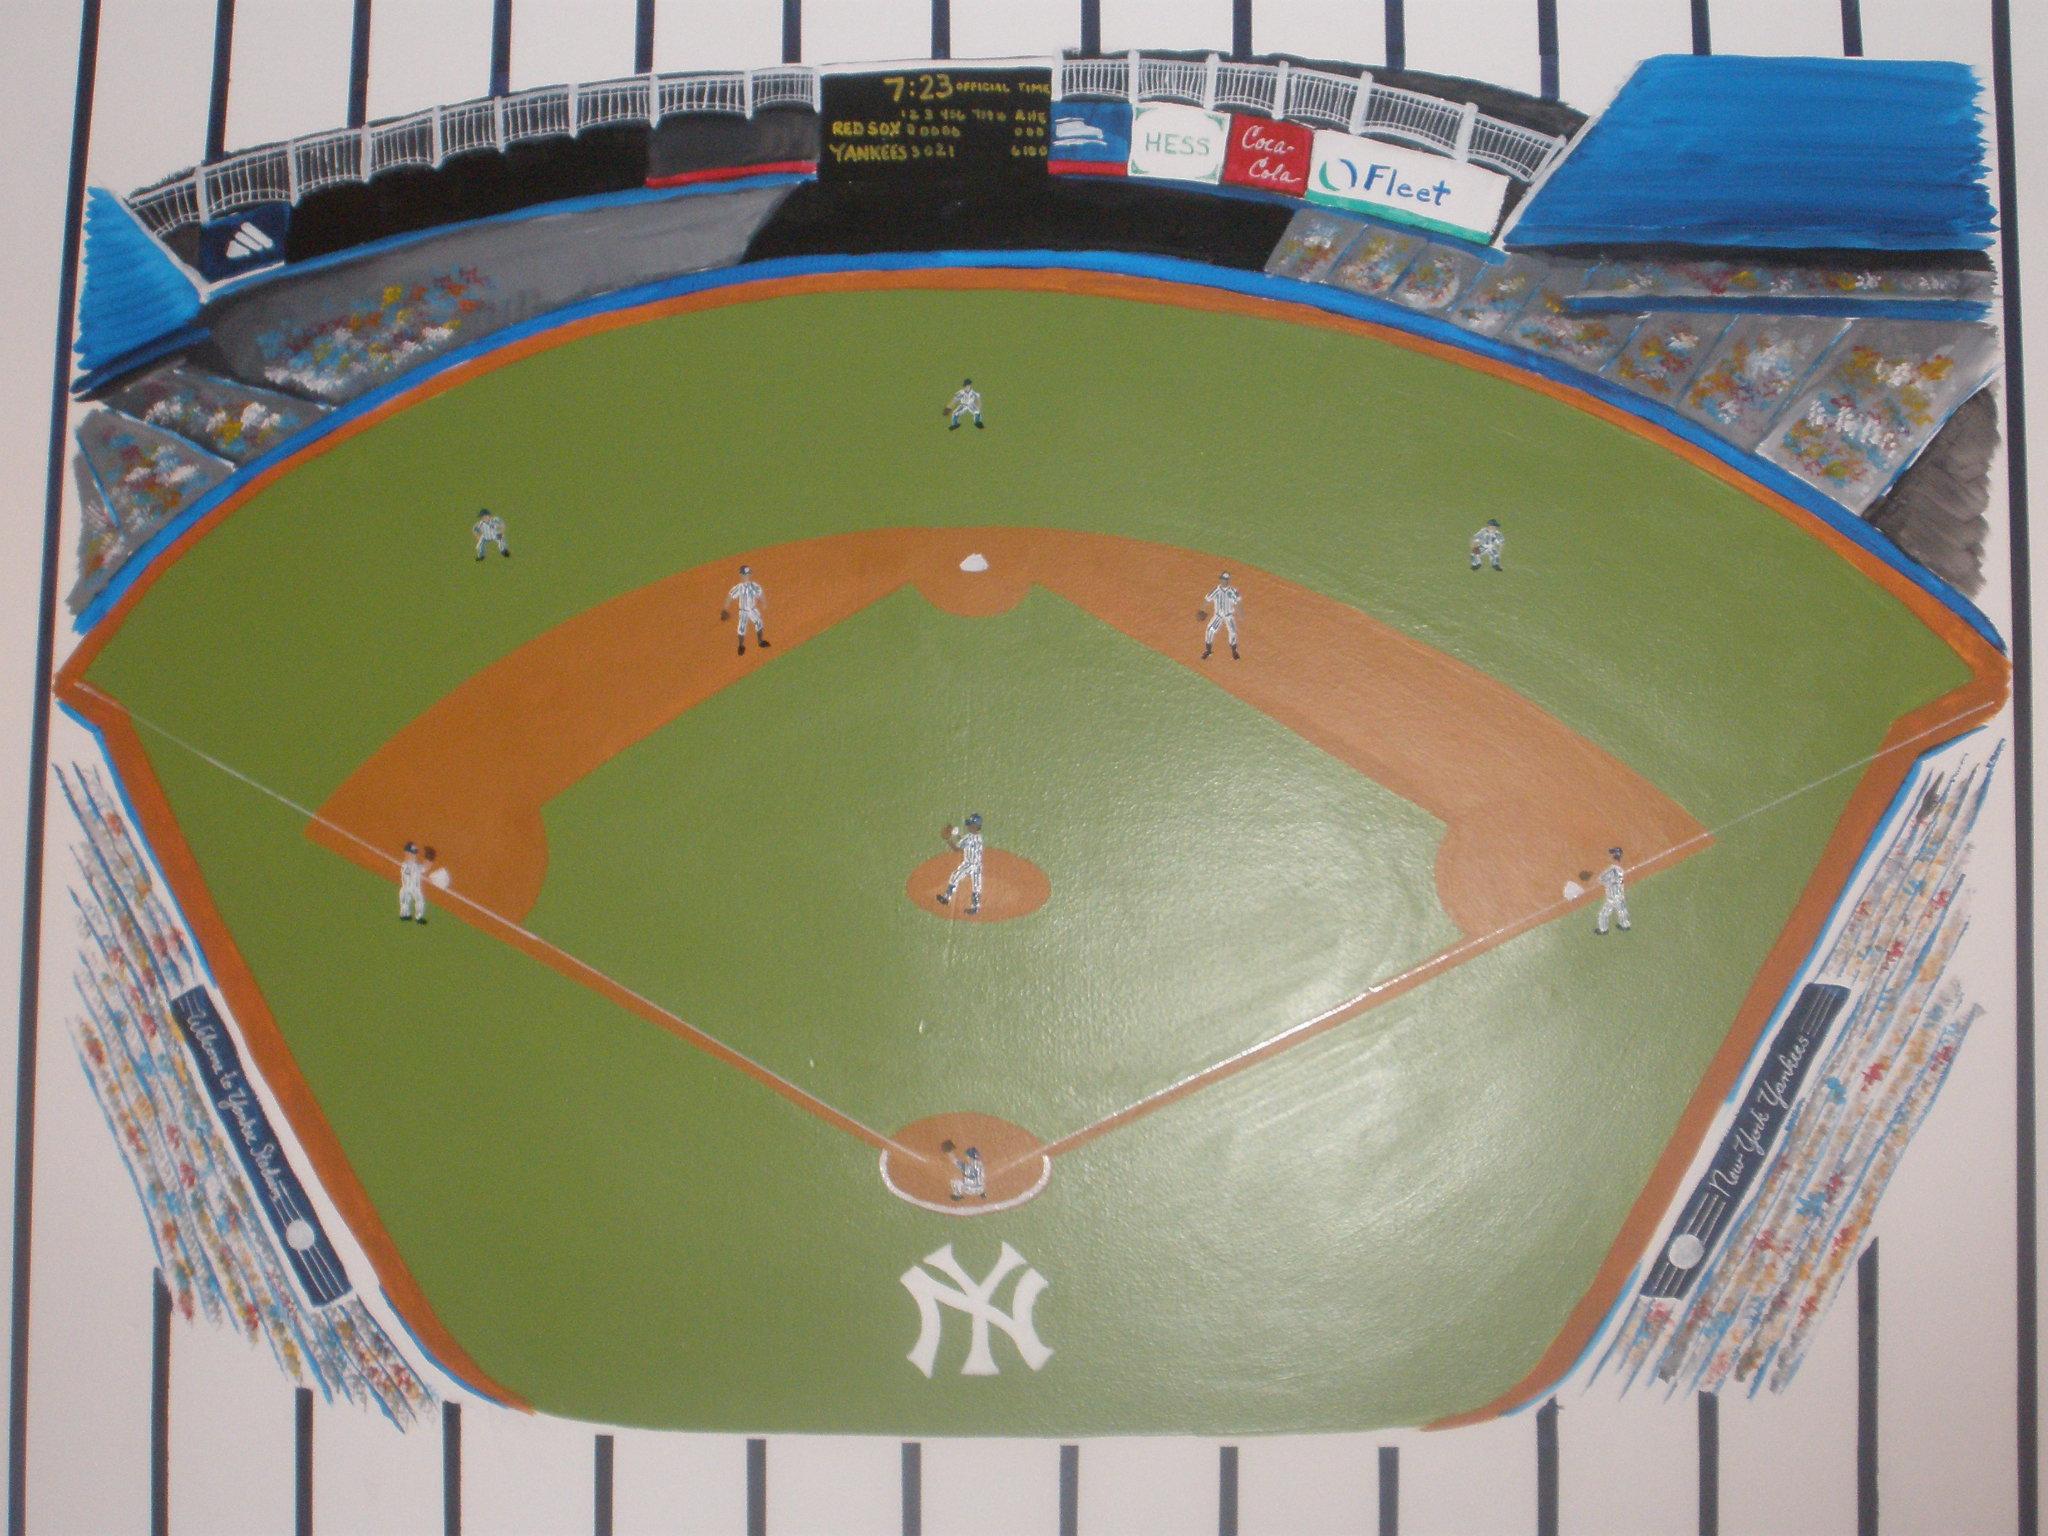 mural html filesize x512 tiger stadium aerial mural 512 512 2048x1536